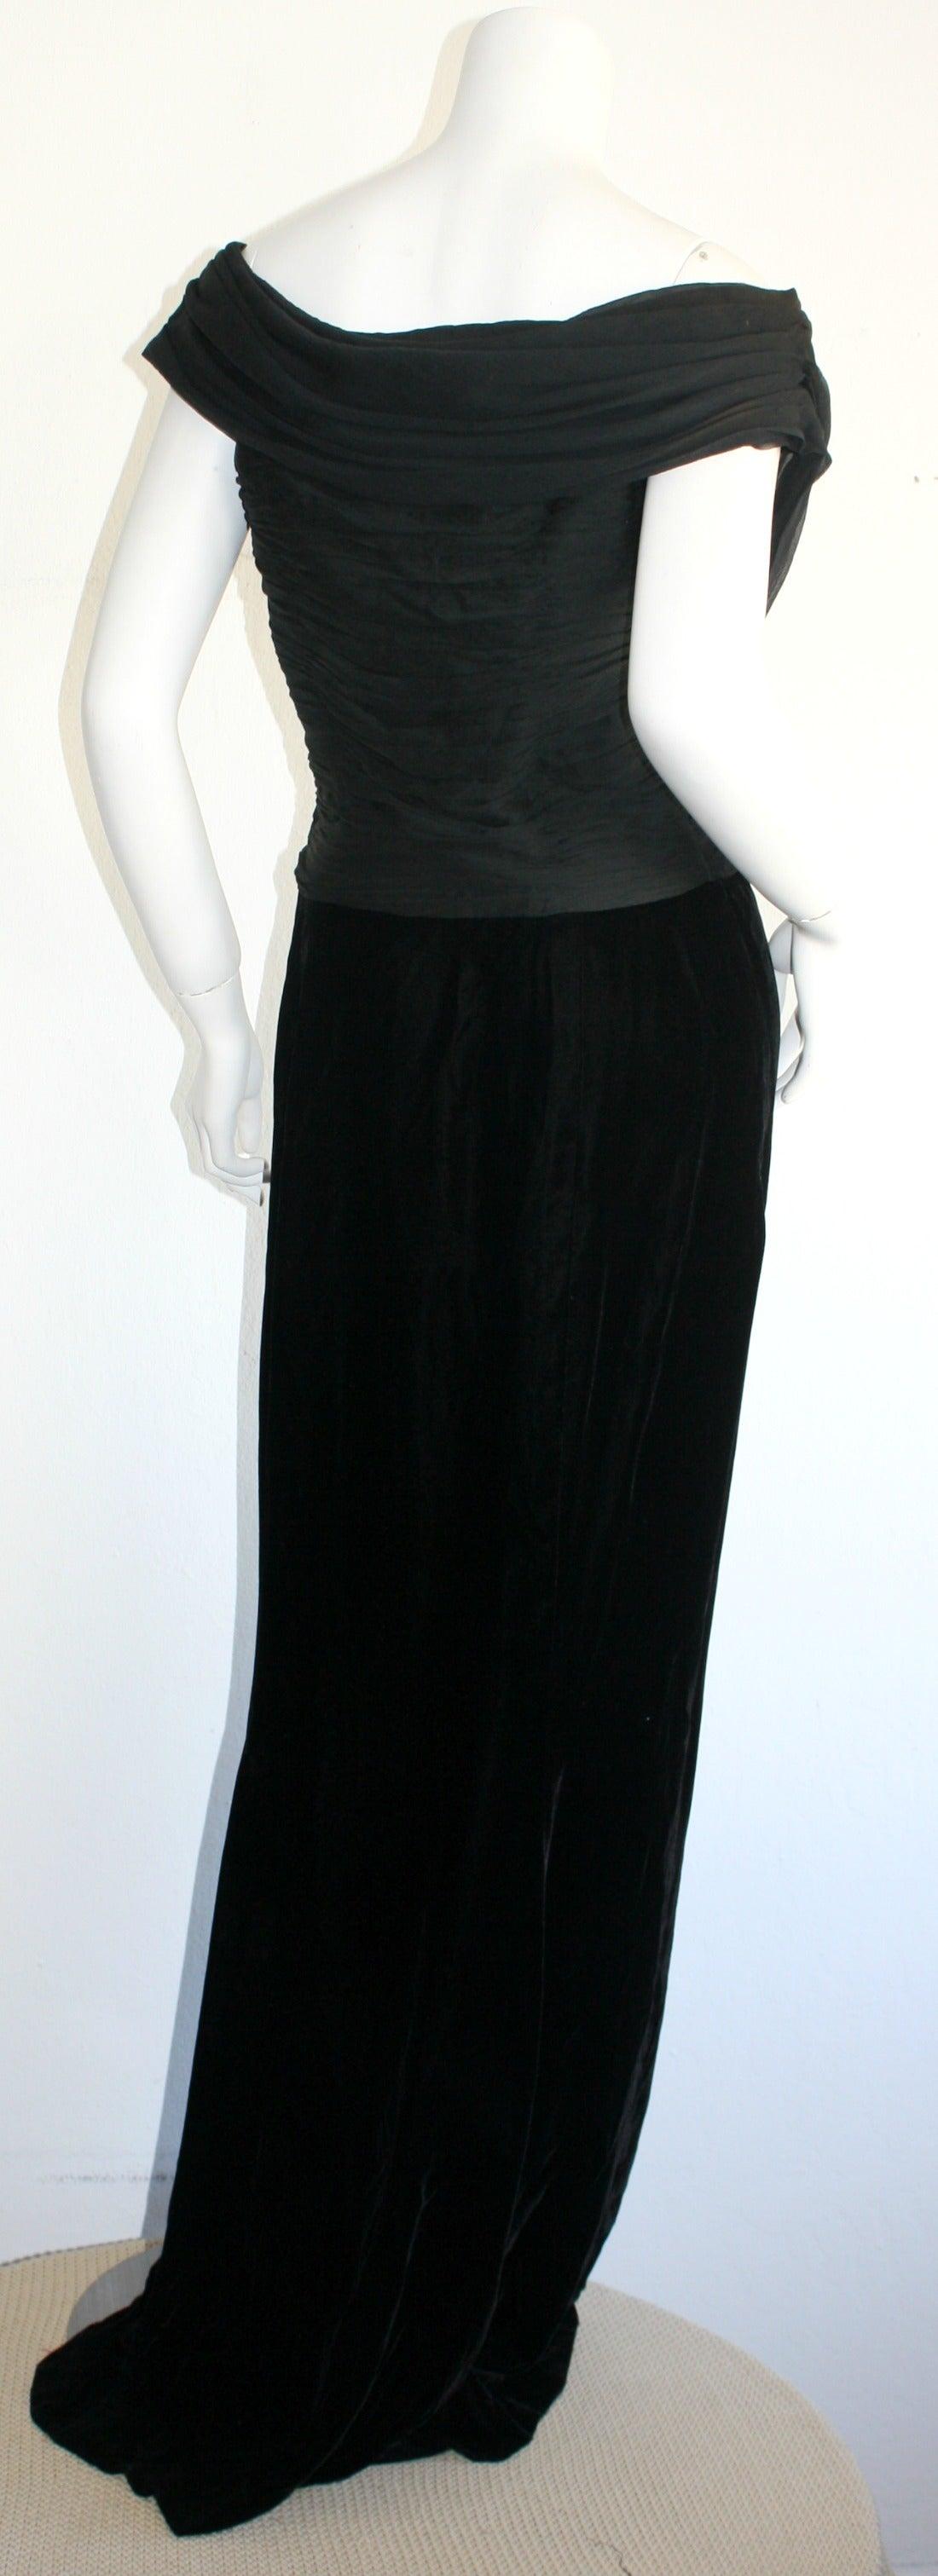 Remarkable Vintage Oscar de la Renta Black Velvet & Chiffon Grecian Gown 6